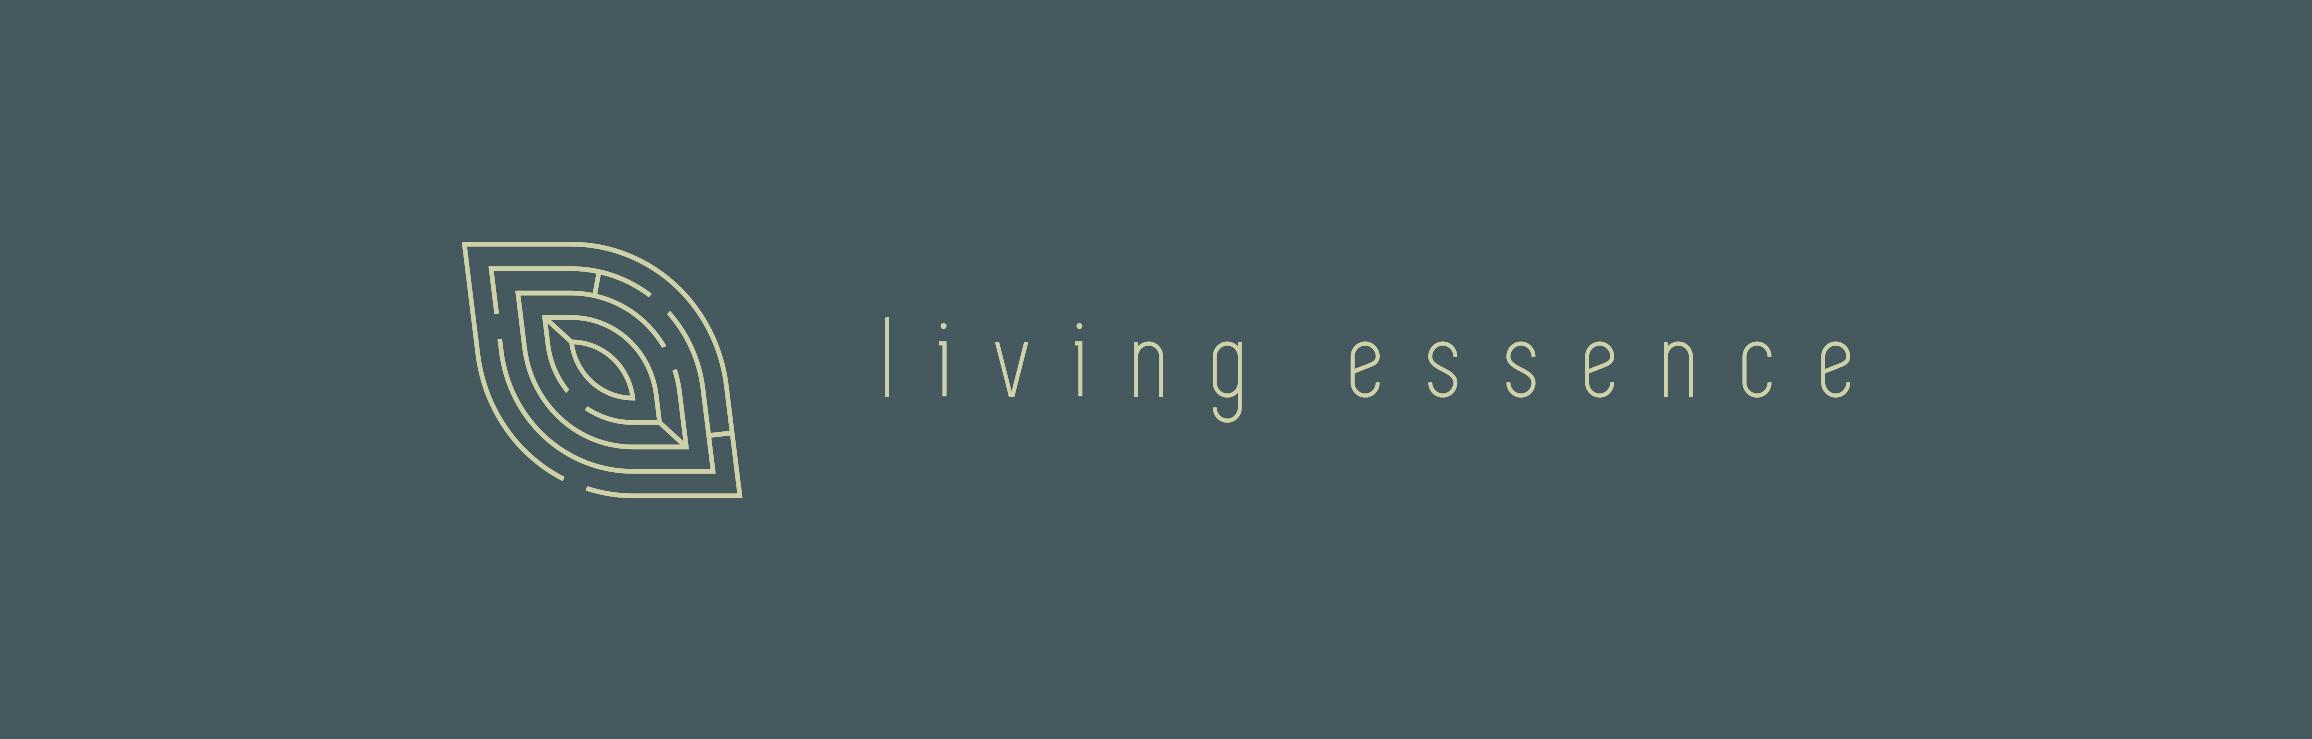 living-essence-2.jpg